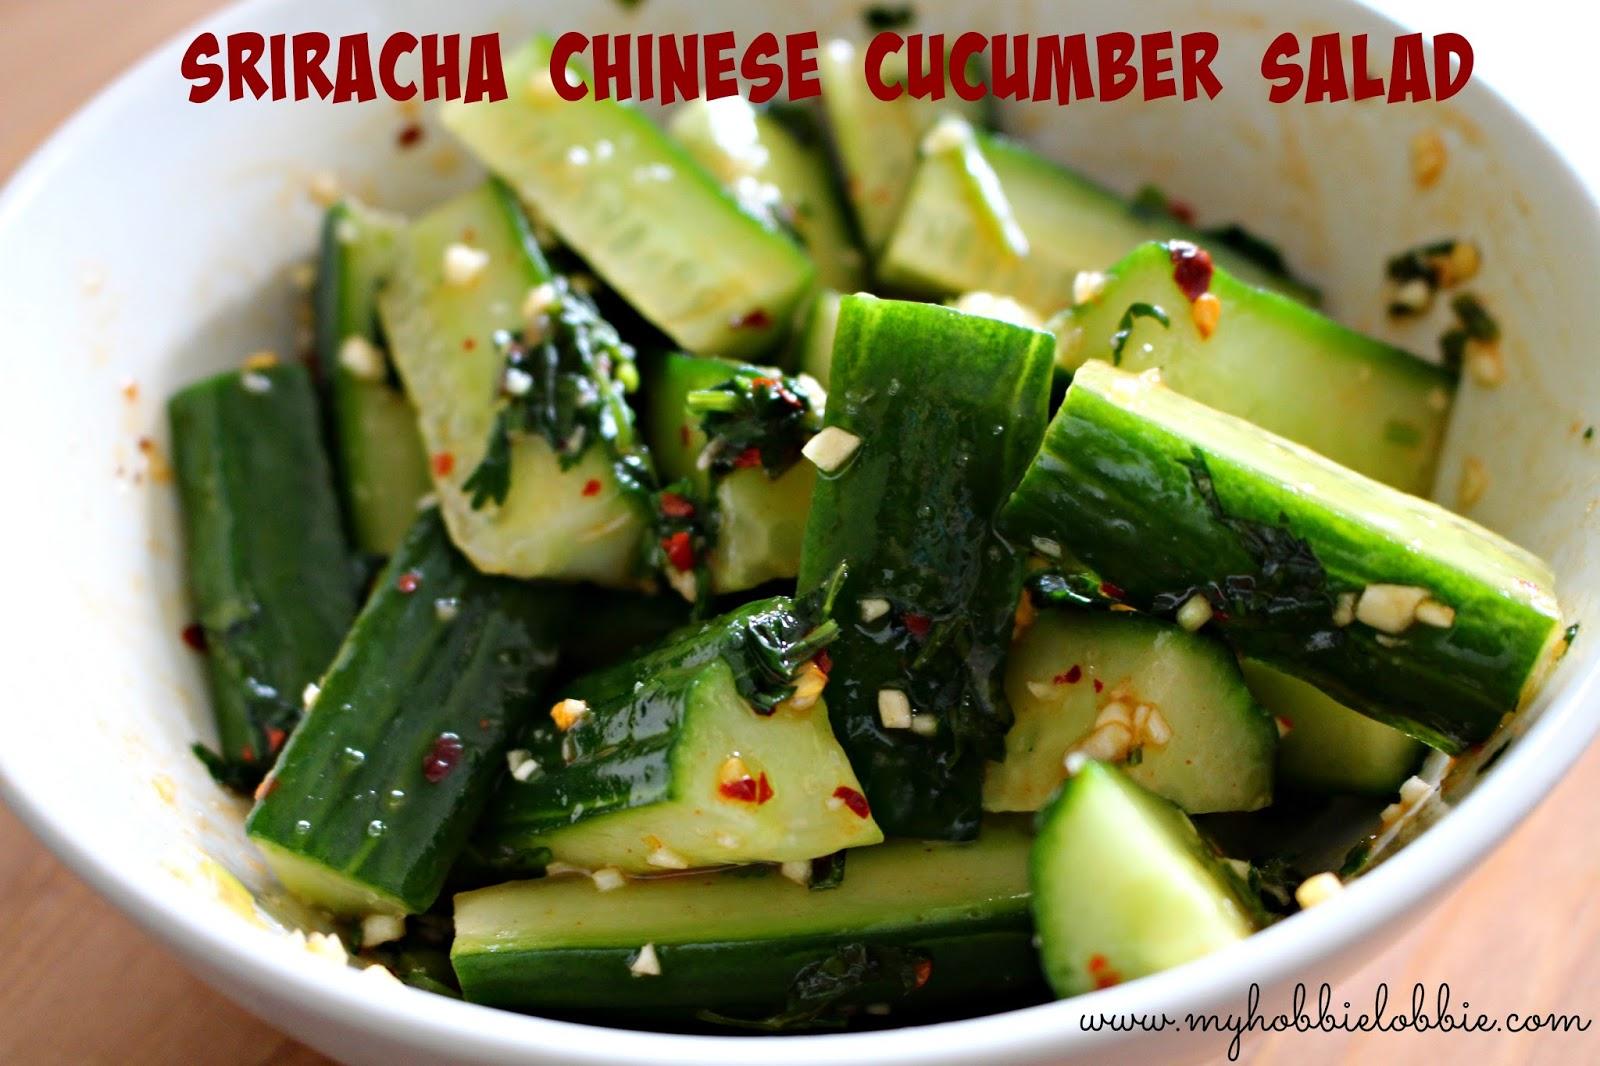 The Aspiring Home Cook: Sriracha Chinese Cucumber Salad